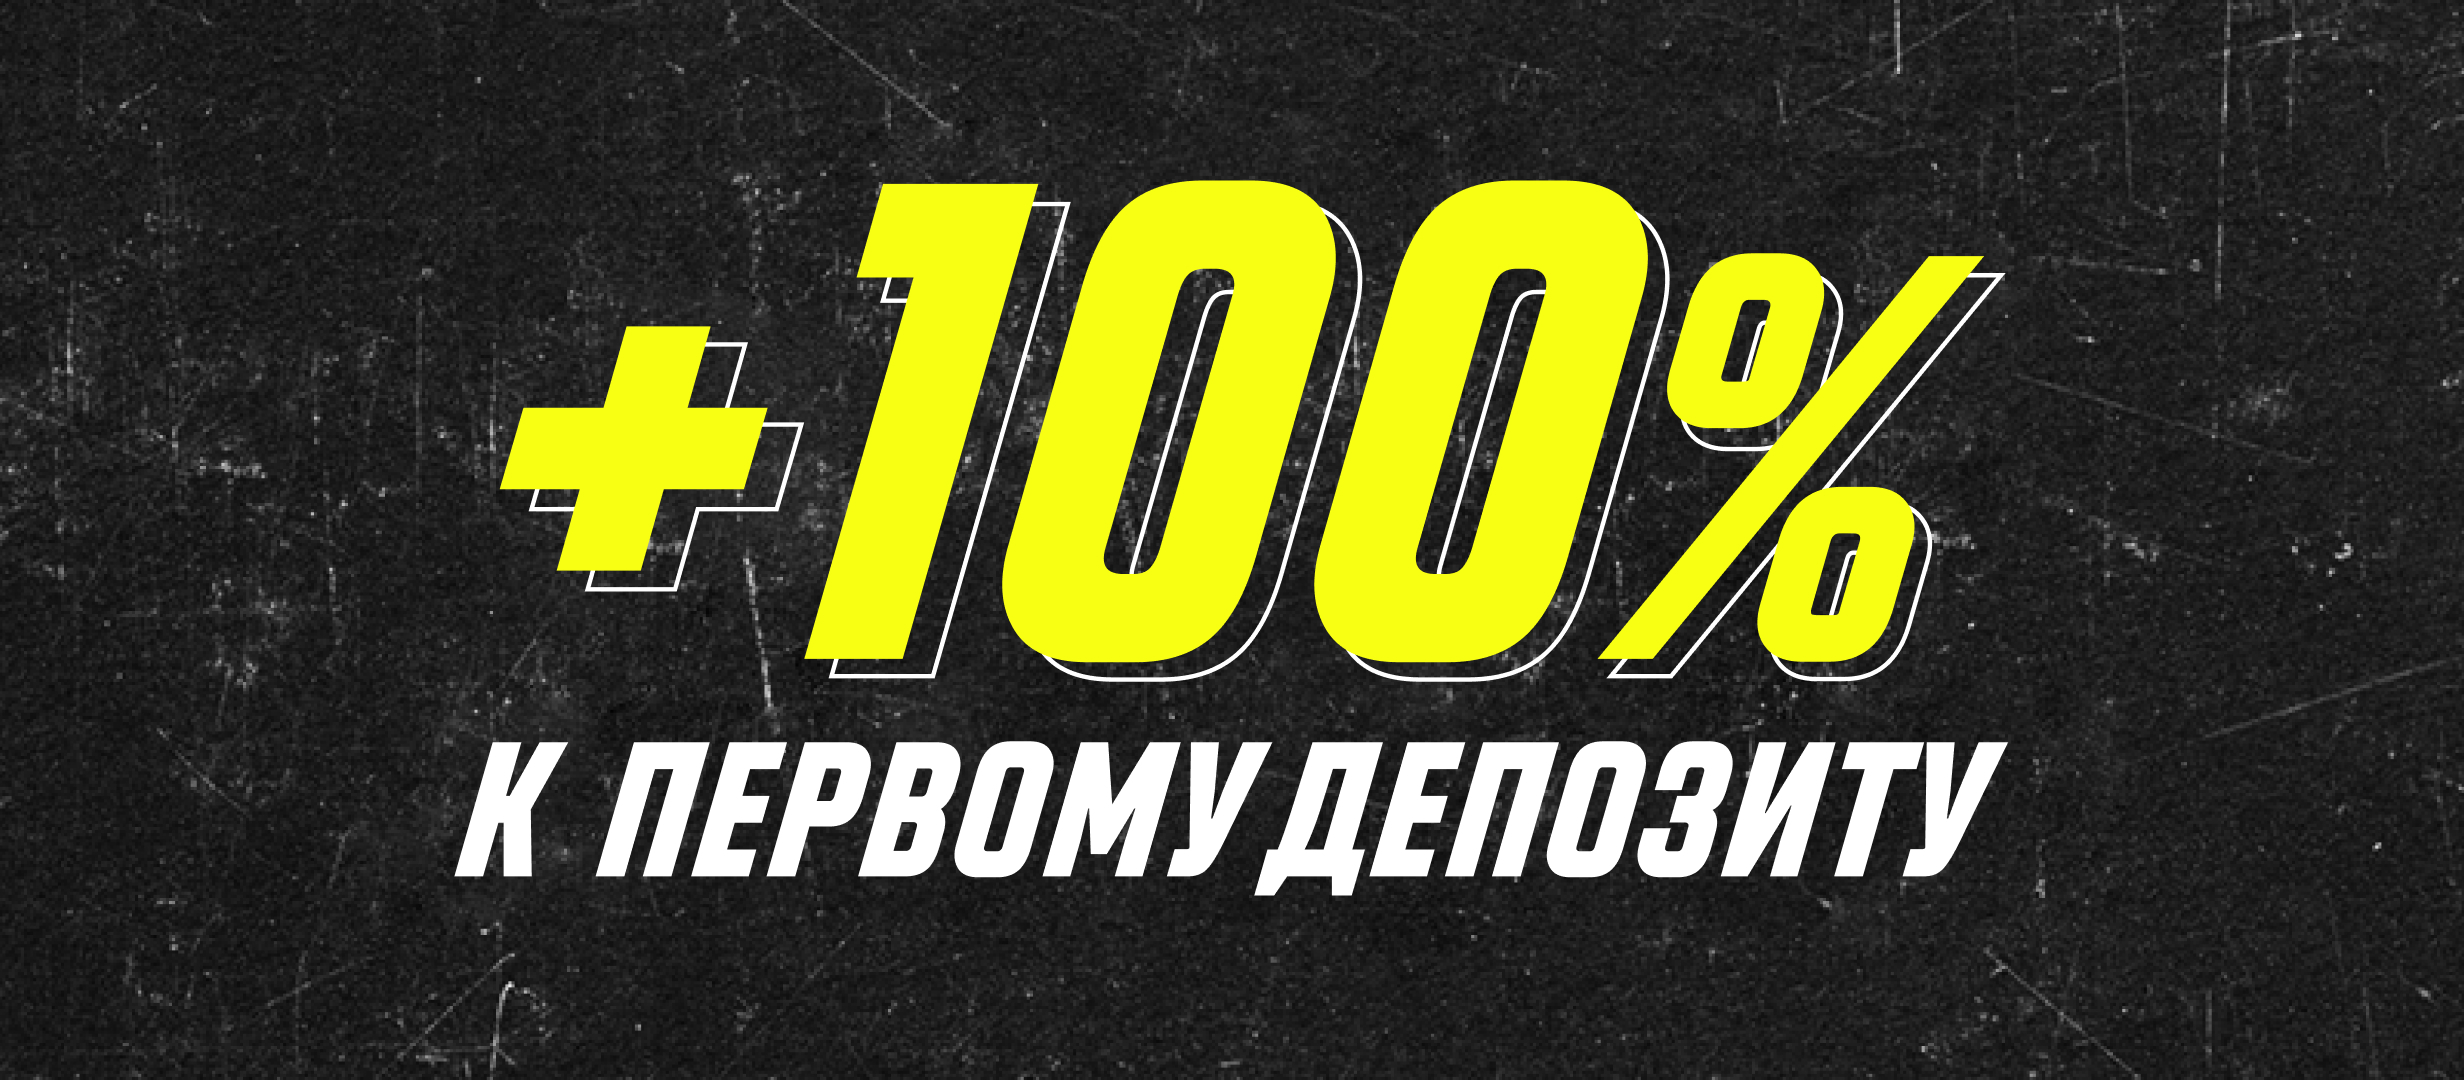 Кеш-бонус от Parimatch 100 руб..